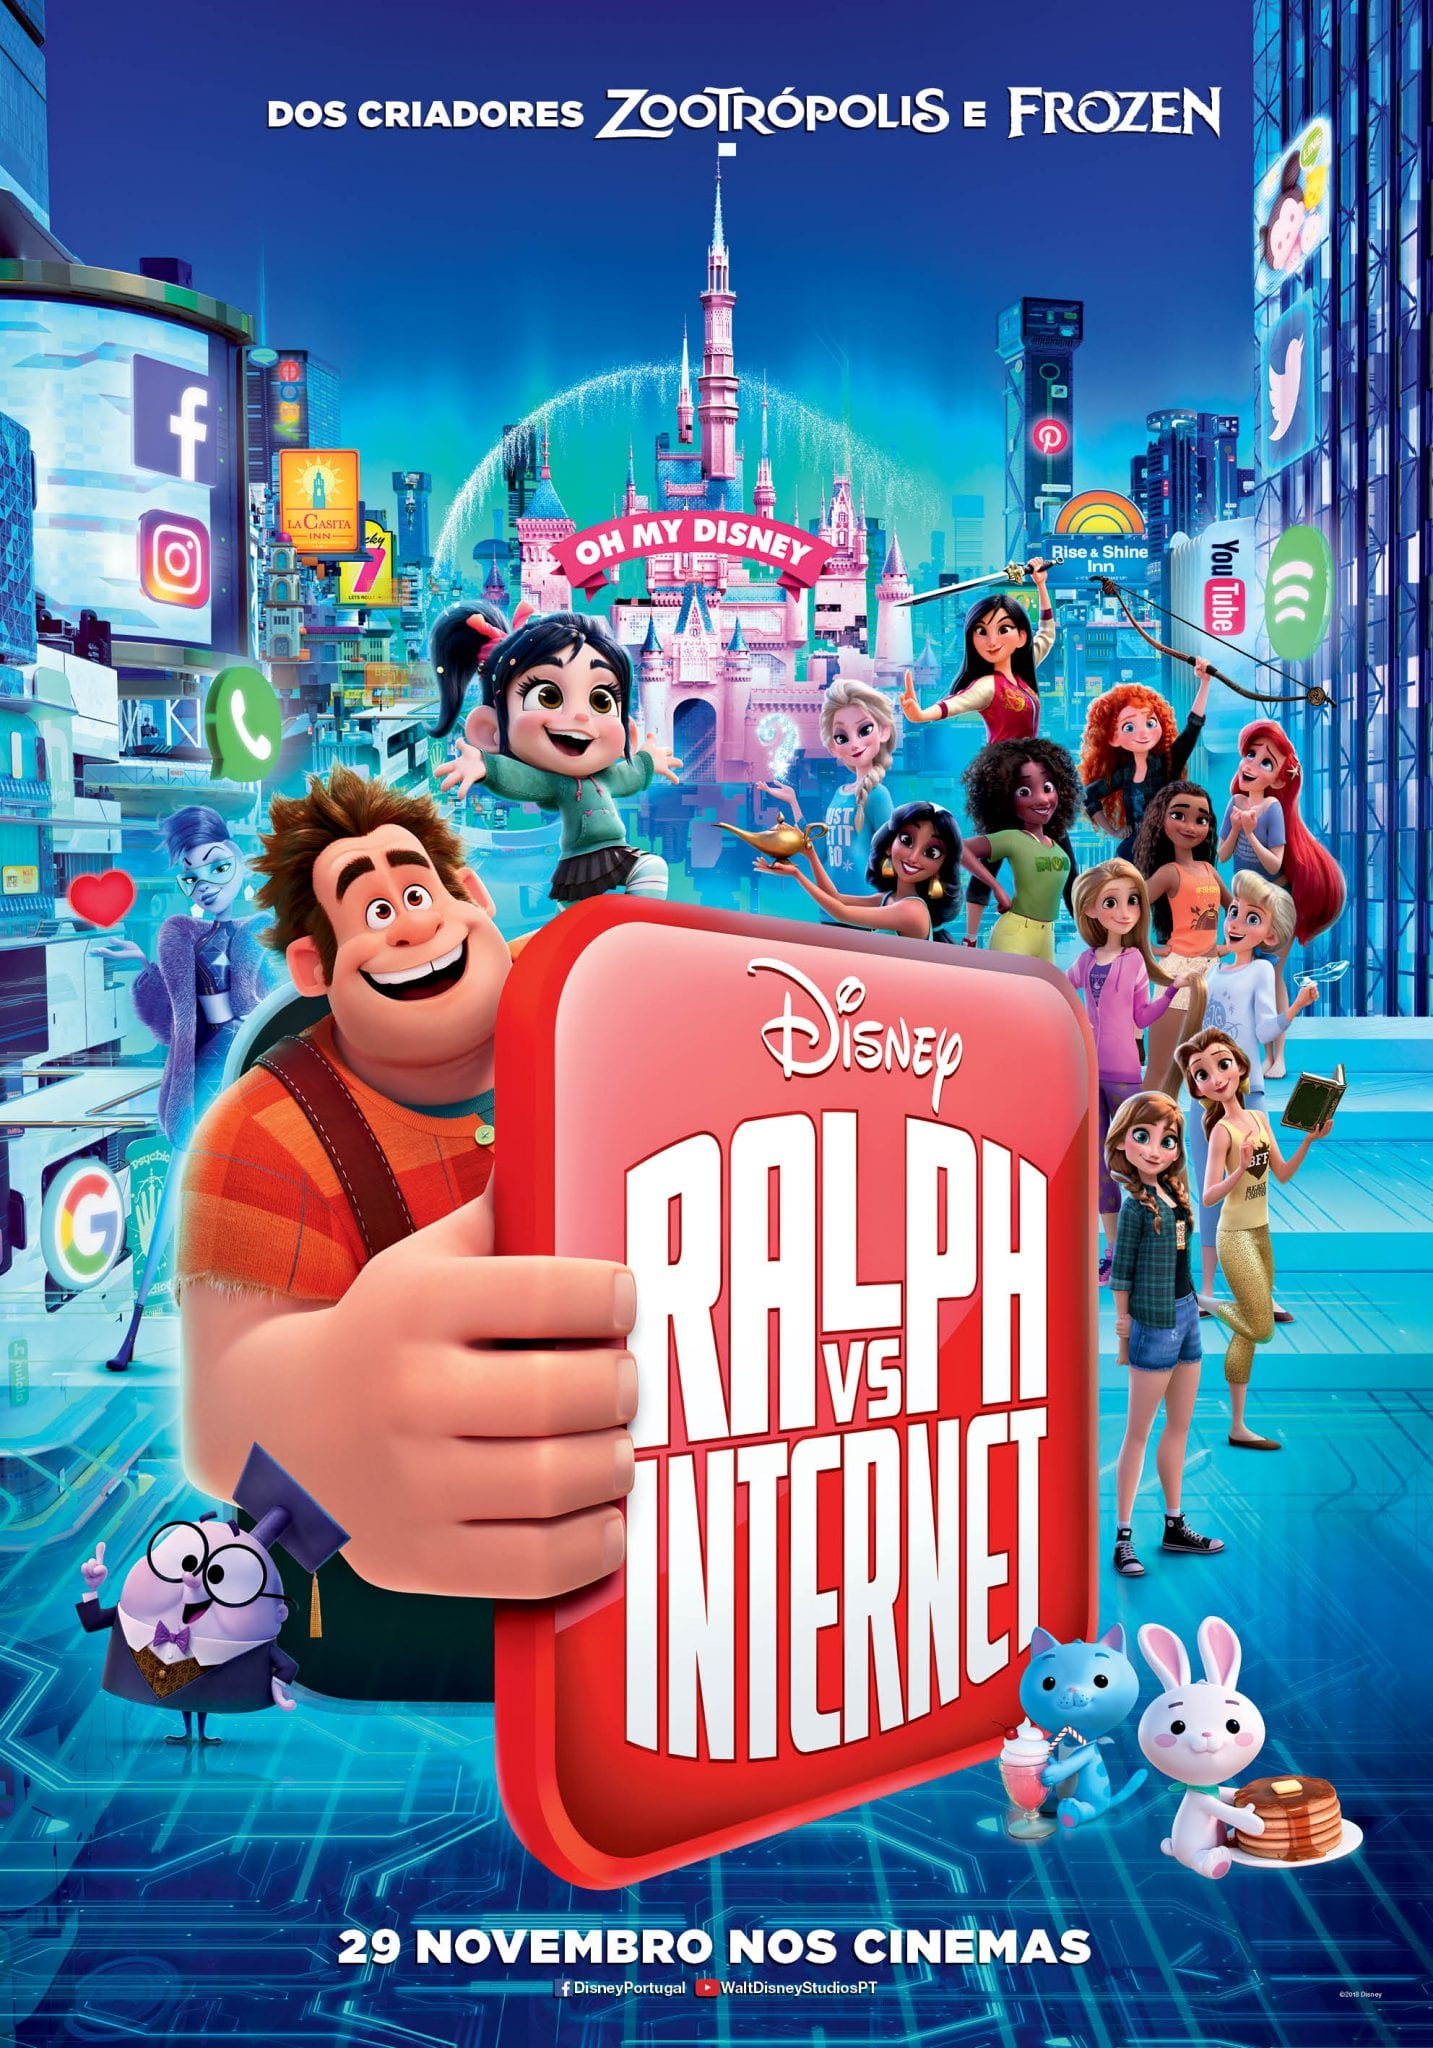 Passatempo Filme Ralph vs Internet